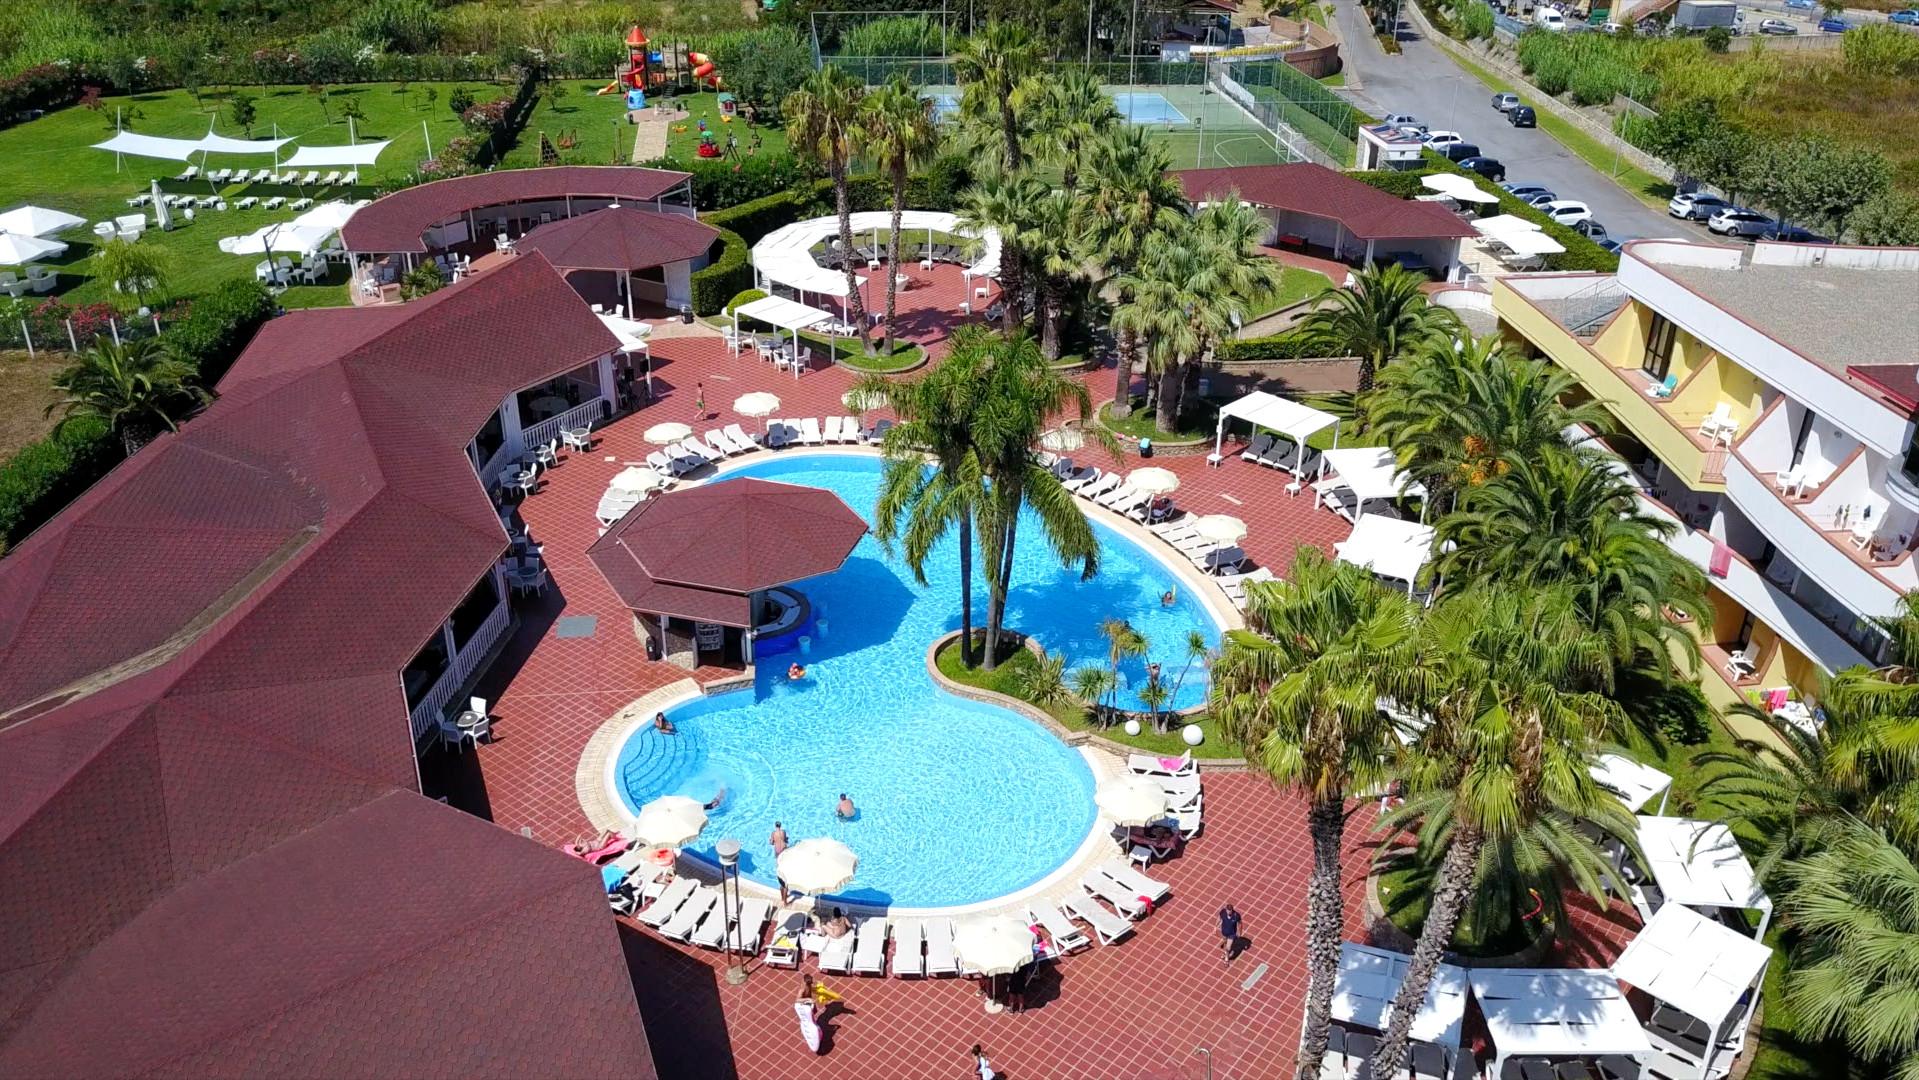 Resort - Vista dall'alto